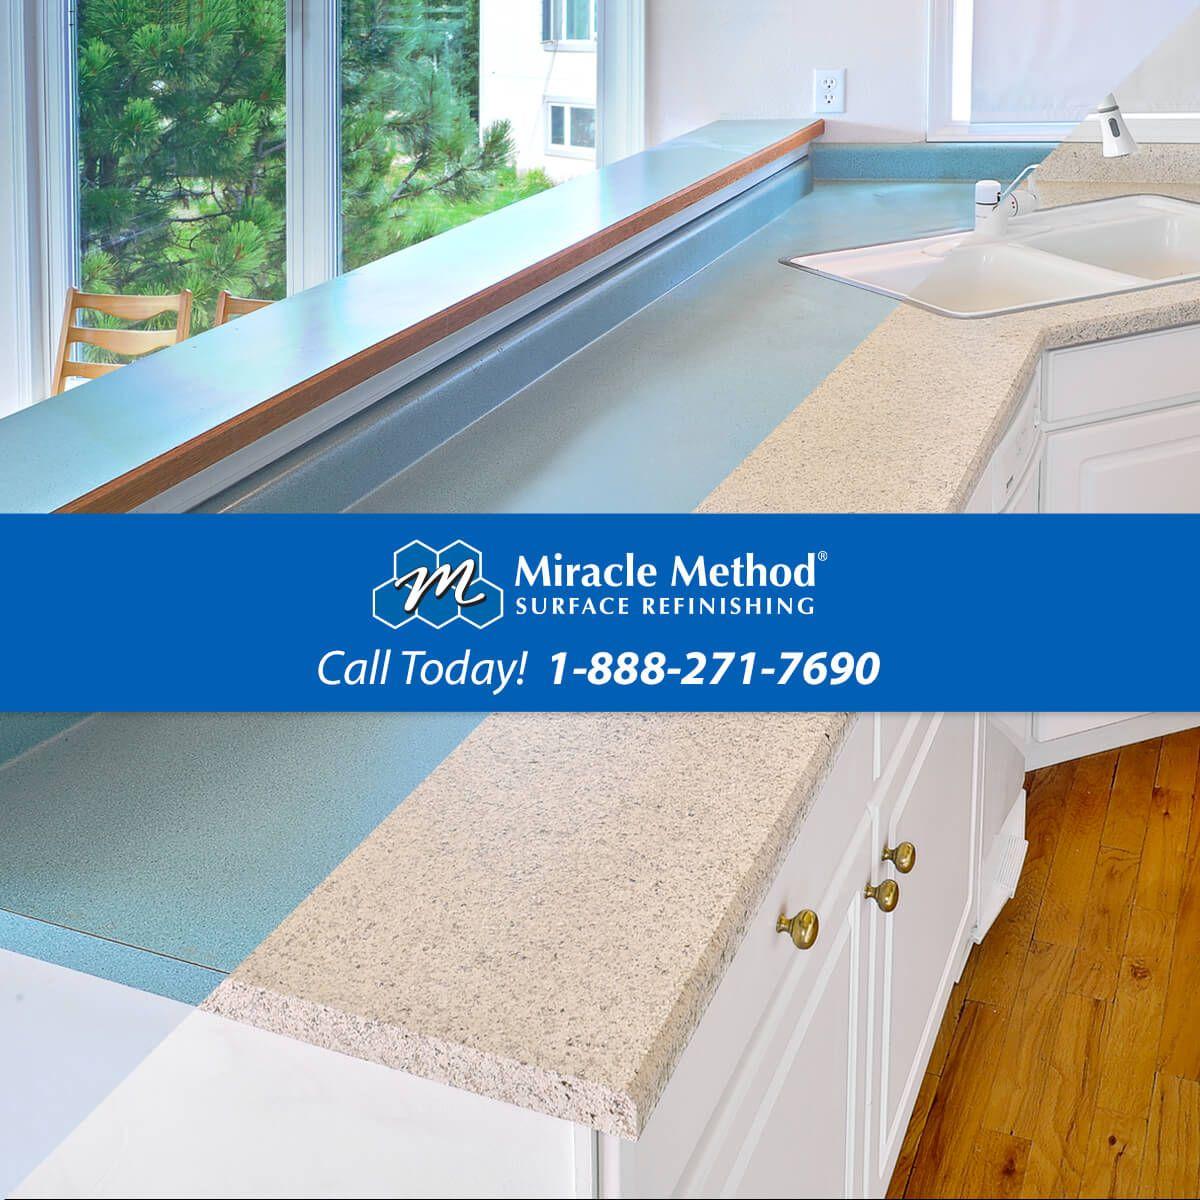 Bathtub Resurfacing - Countertop, Bathroom Tub and Tile Refinishing ...